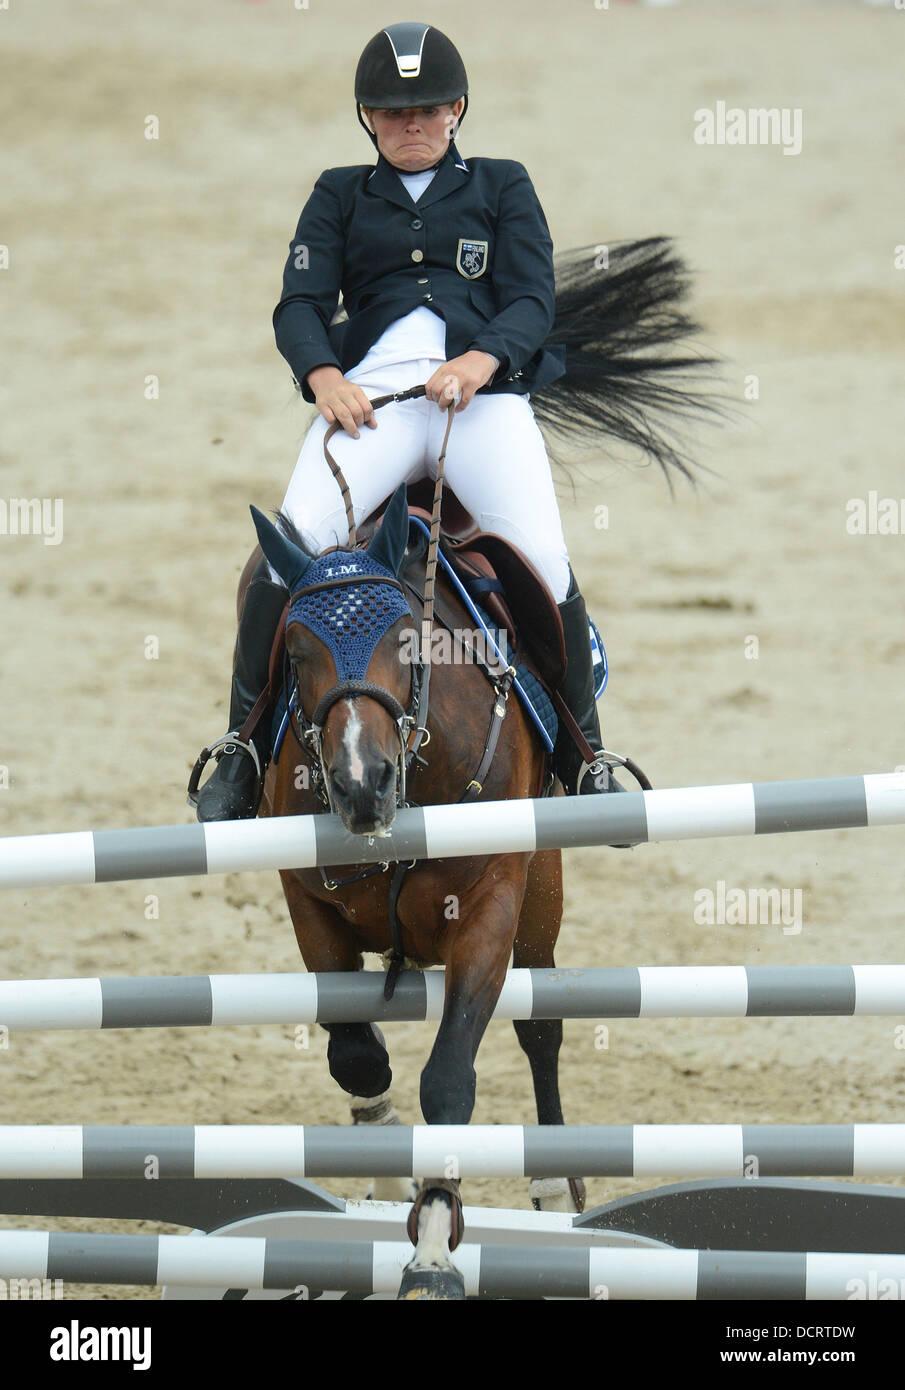 Herning, Denmark. 21st Aug, 2013. Finnish show jumper Satu Liukkonen and her horse Celestine knock down an obstacle - Stock Image